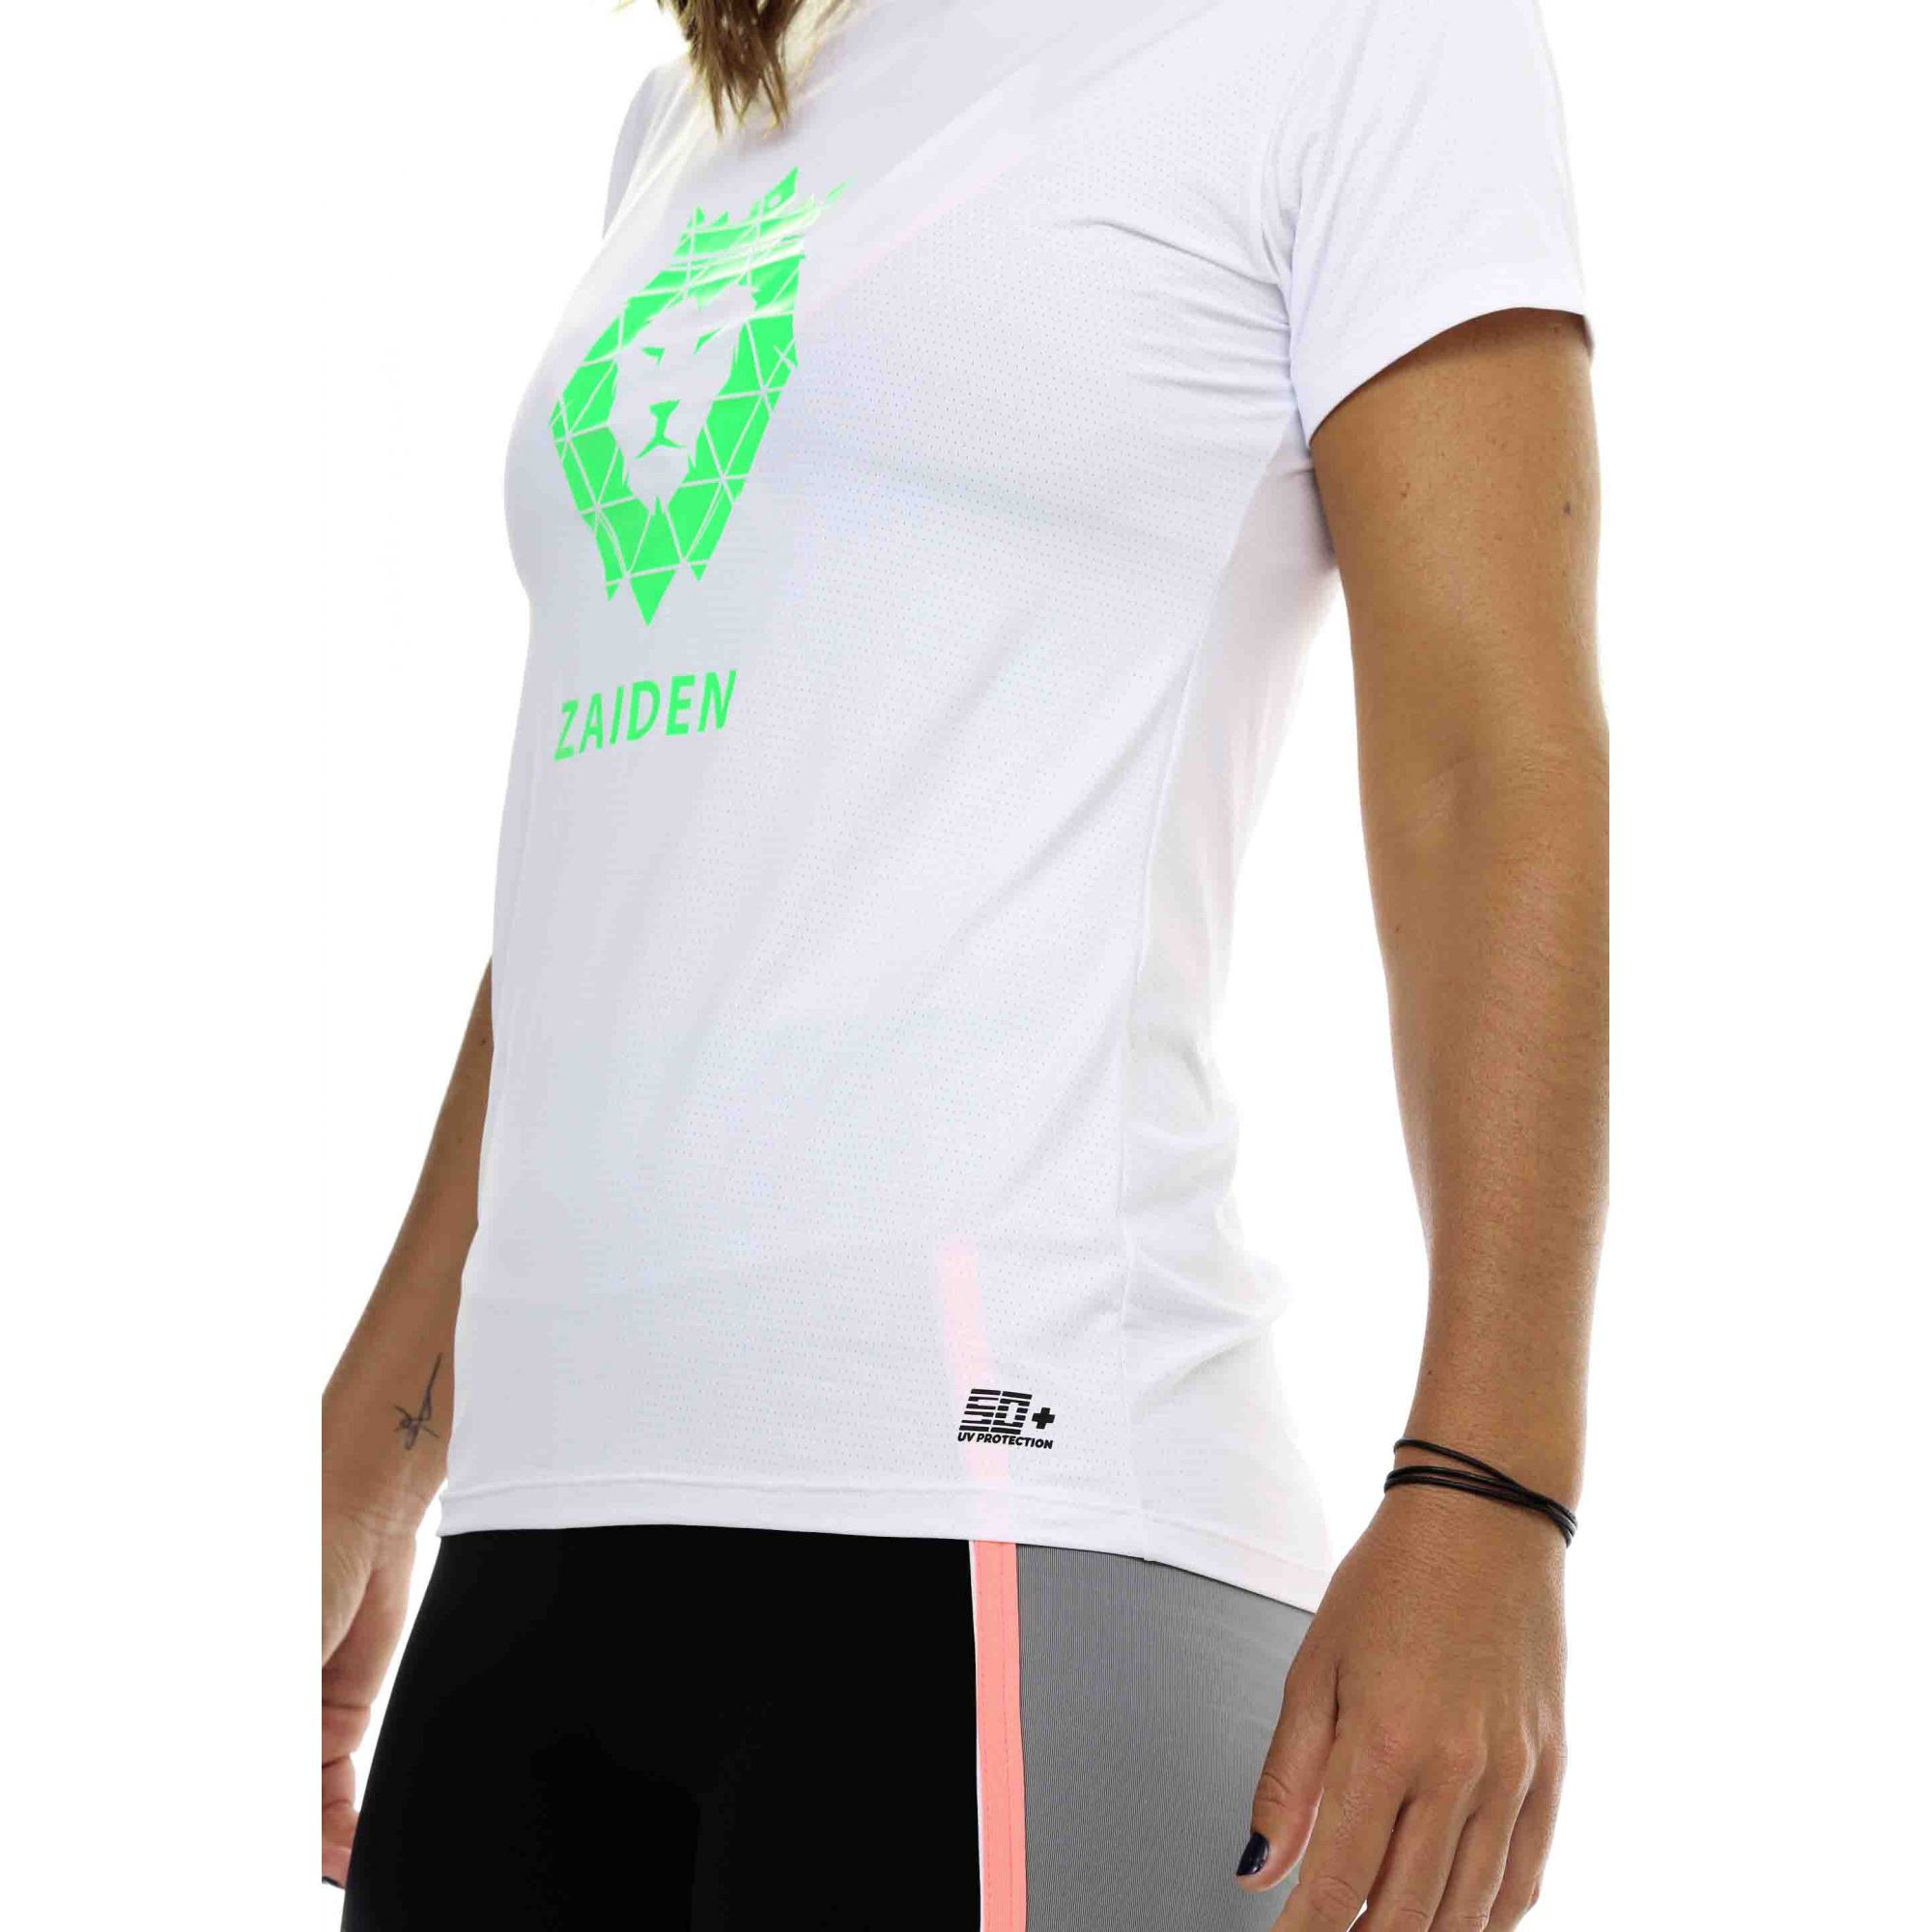 Camiseta Feminina Poliamida ZAIDEN Branca Leão Verde